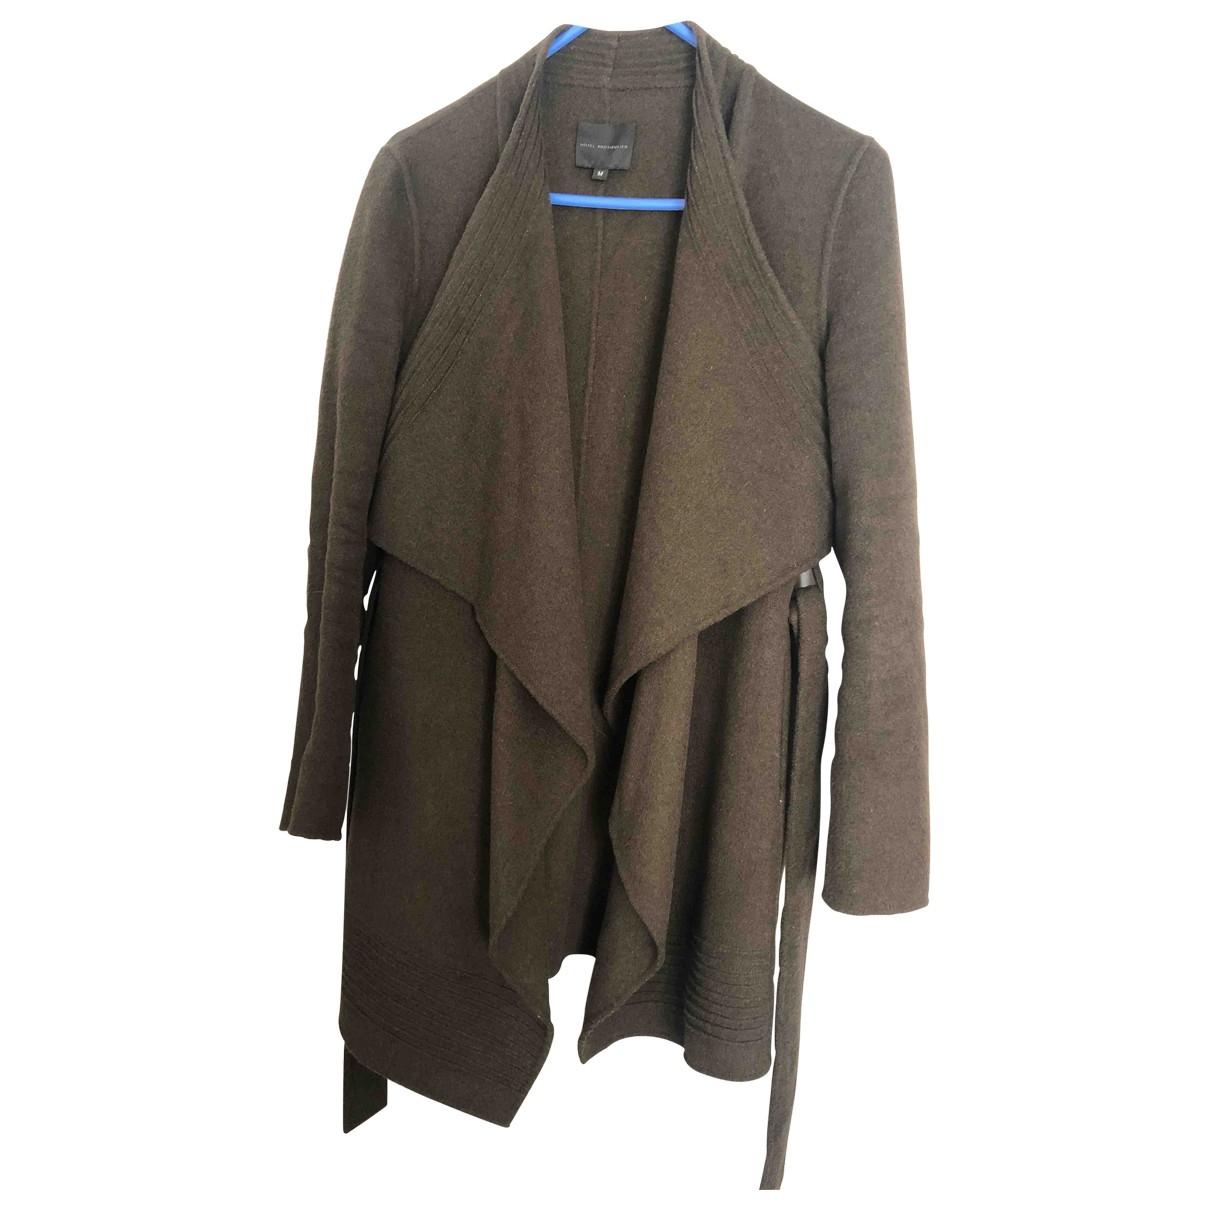 Hôtel Particulier \N Khaki Wool coat for Women 38 FR